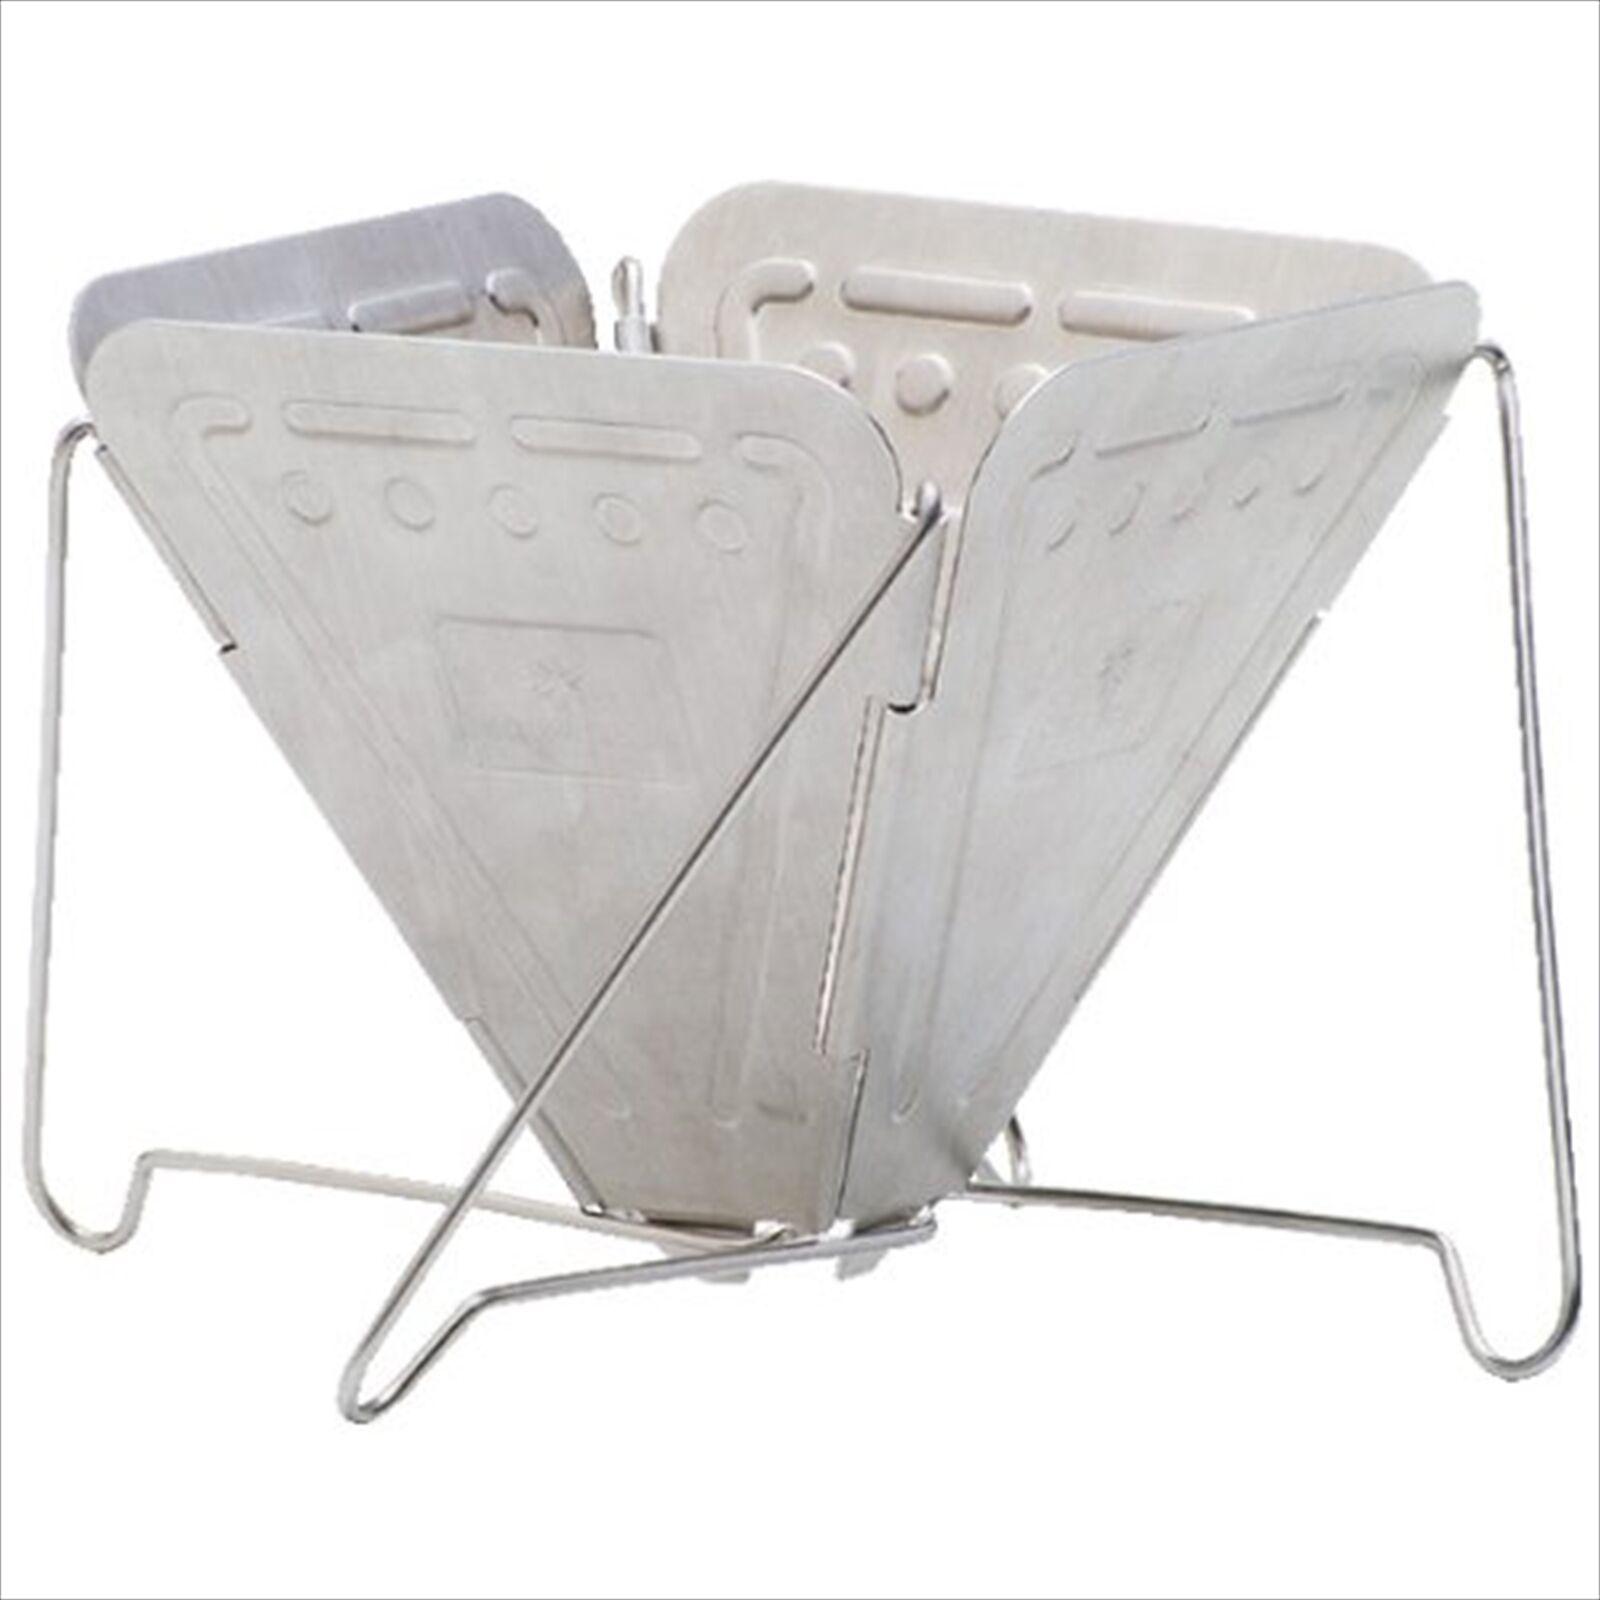 Snow Peak Folding Coffee Dripper fire table type CS-113